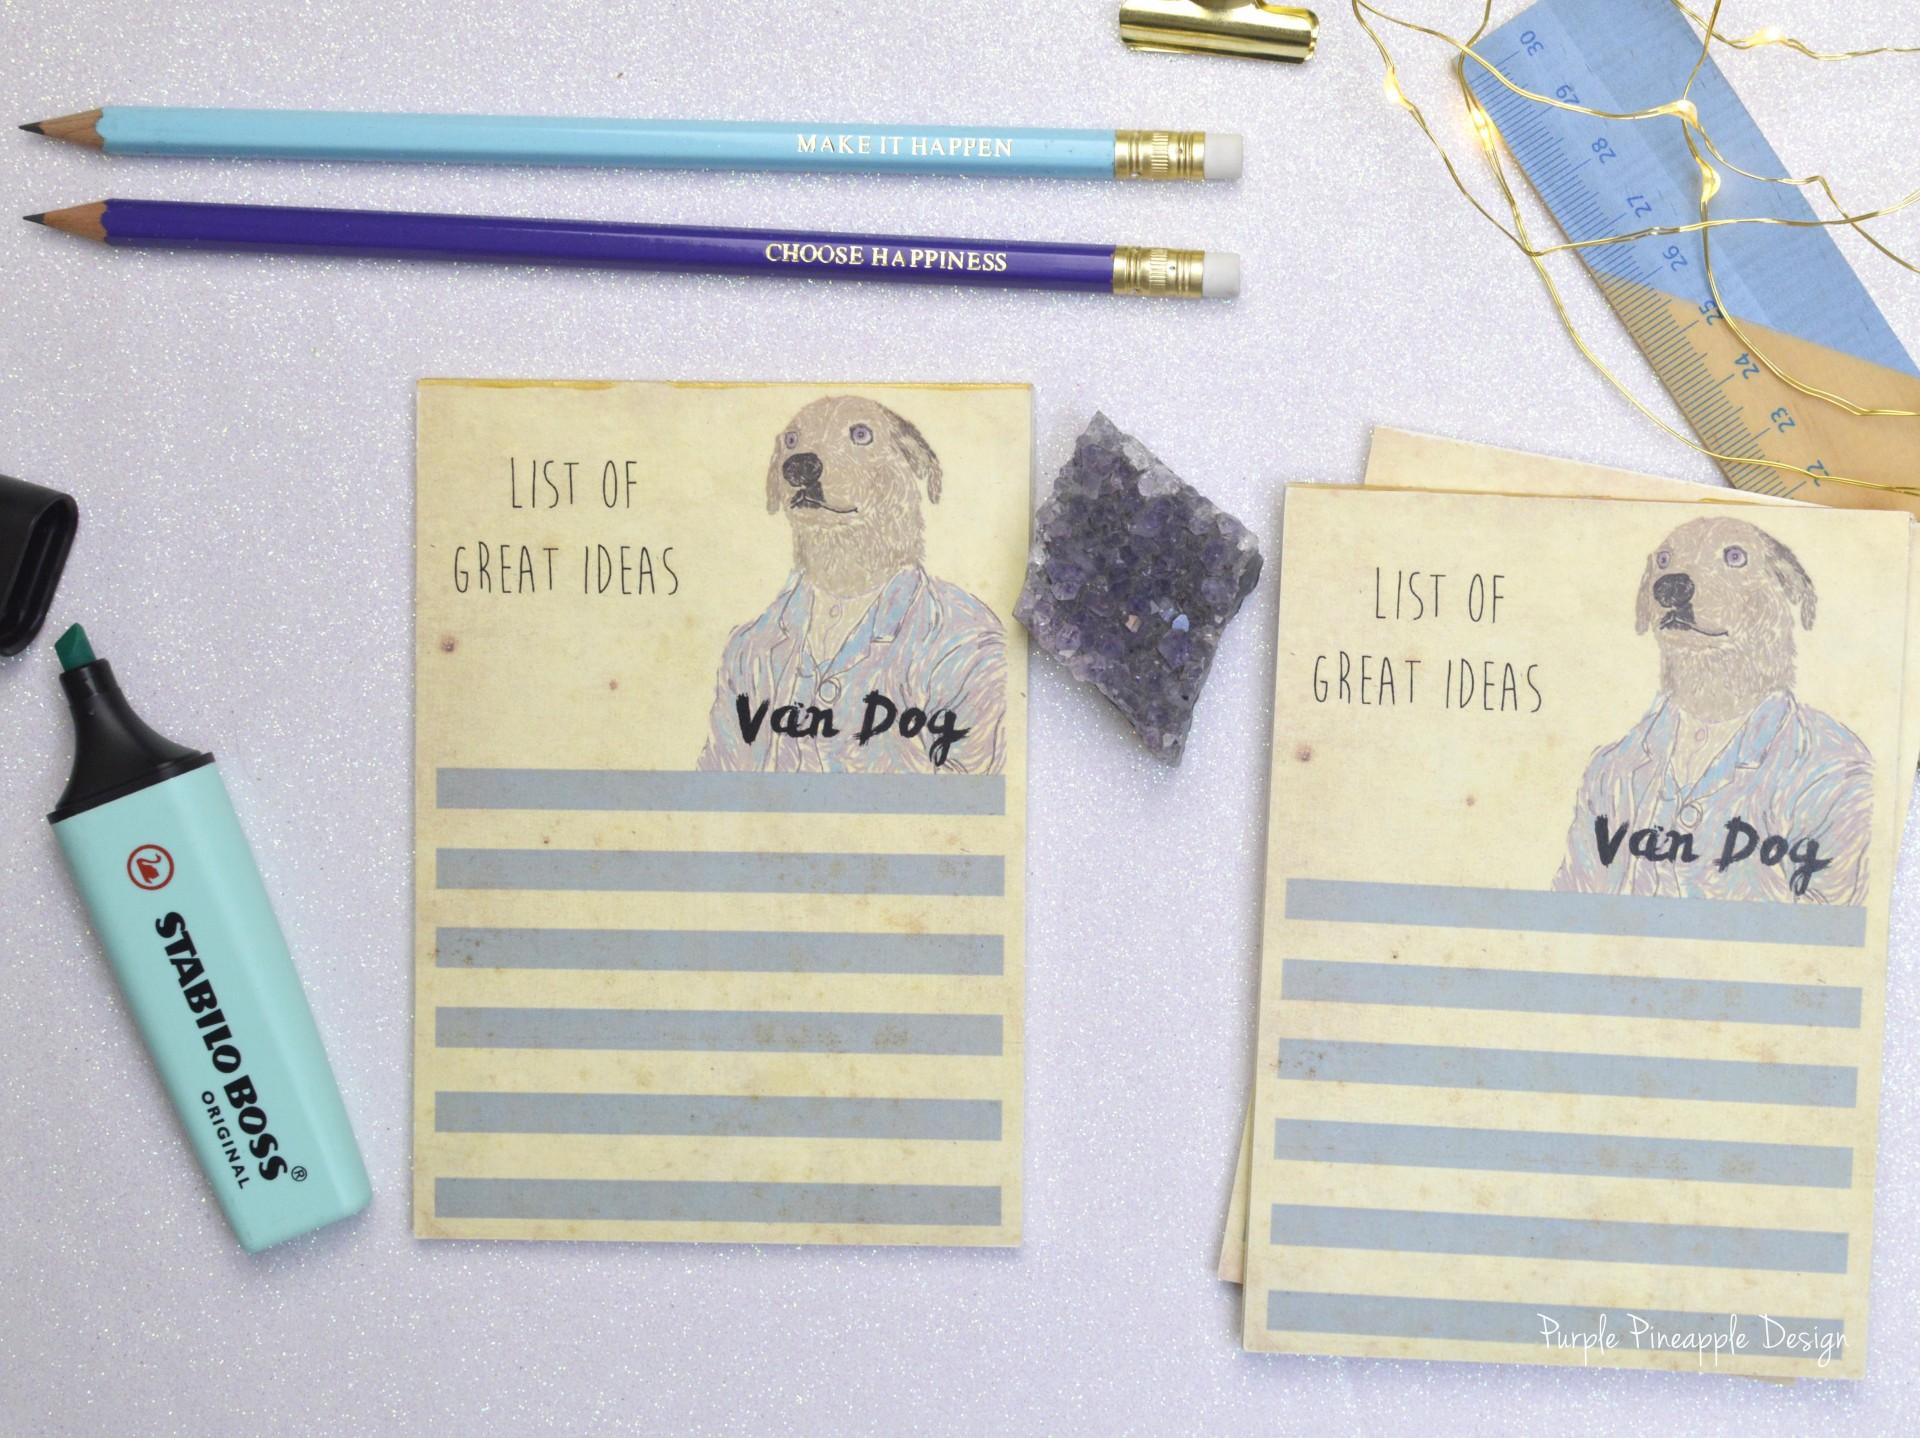 Van Dog: List of great ideas